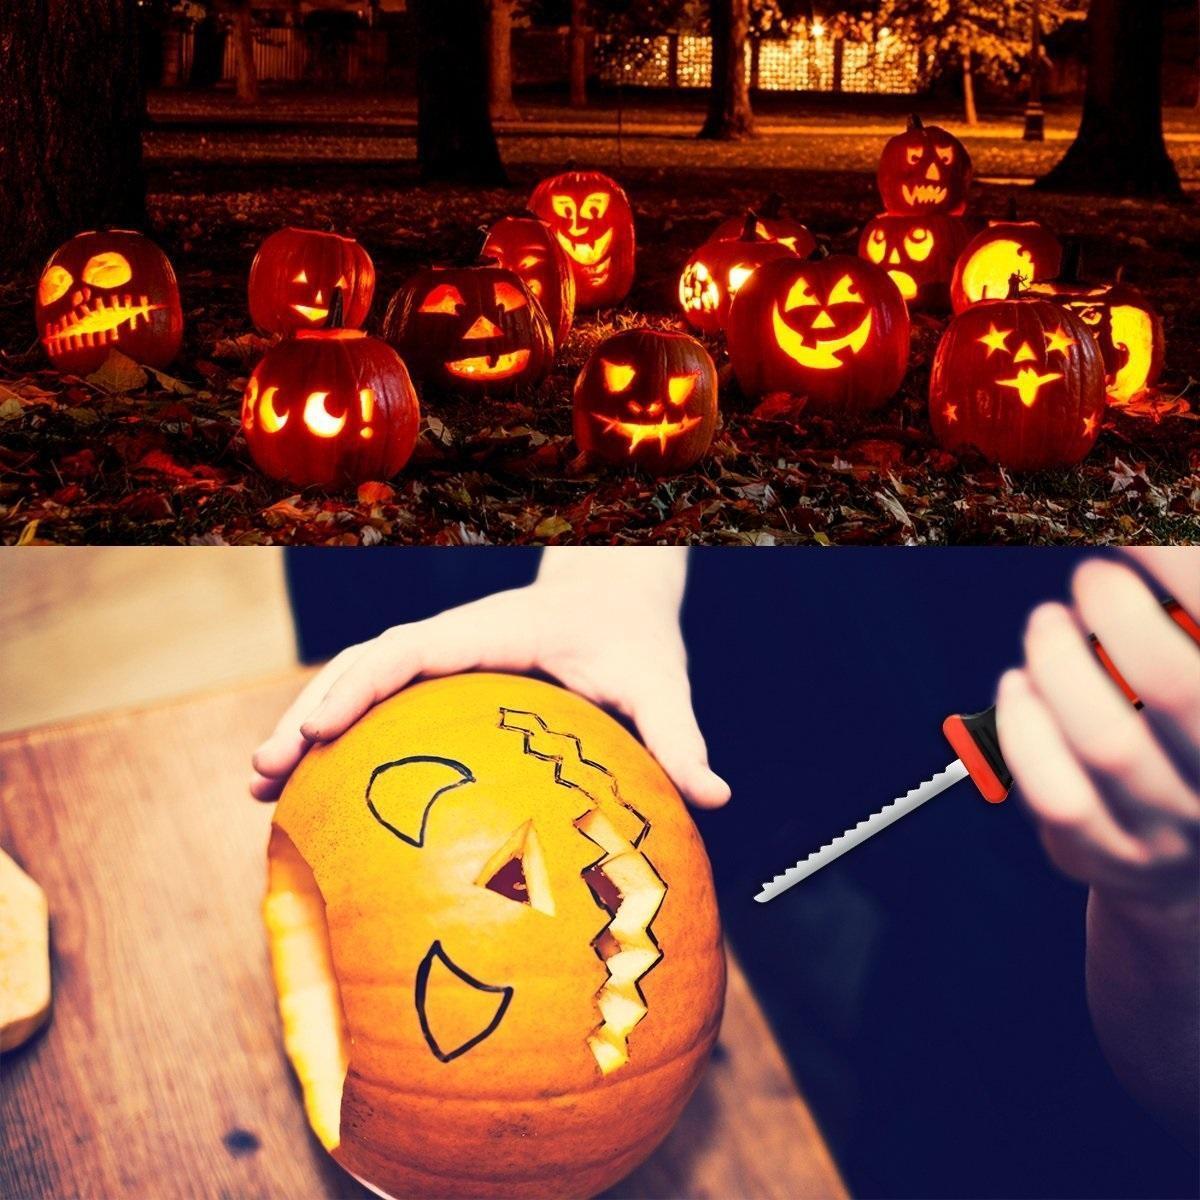 2020 Halloween Pumpkin Carving Kit Halloween Decorations Diy Tool Adult Children Pumpkin Lantern Carving Toy Knife Set Xd23968 From Seals168 3 63 Dhgate Com